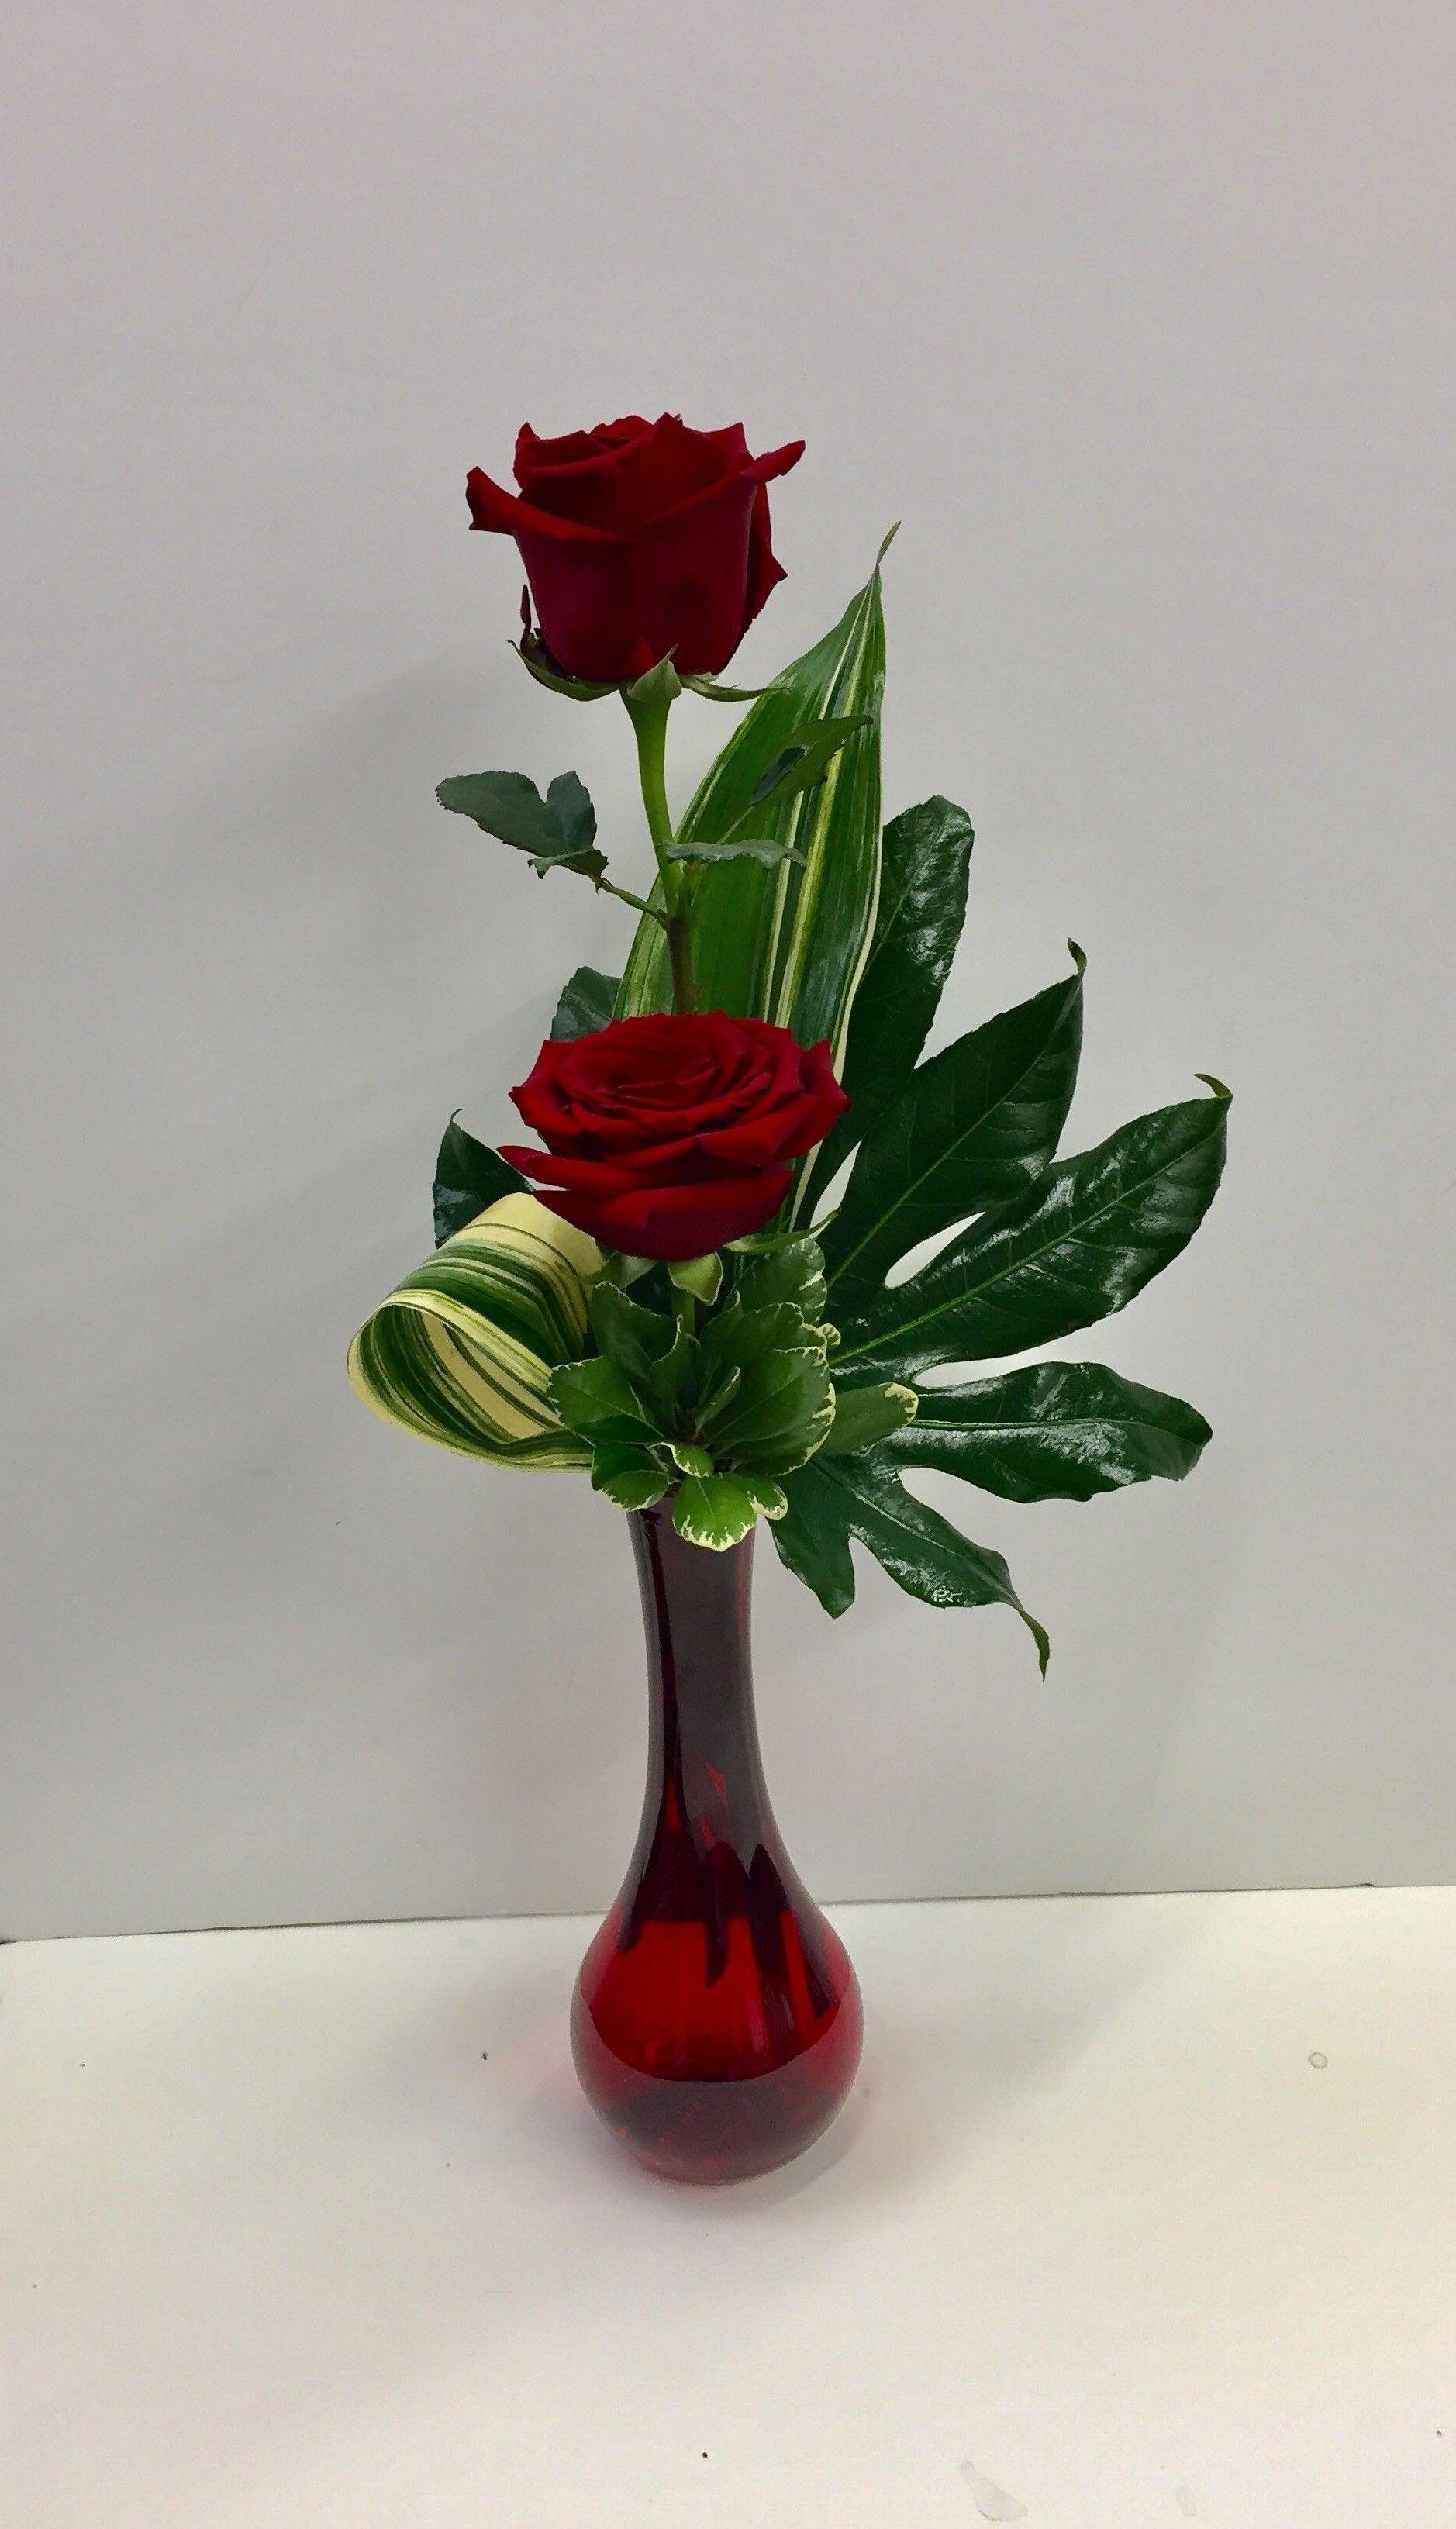 Image result for flower arrangement with a single rose